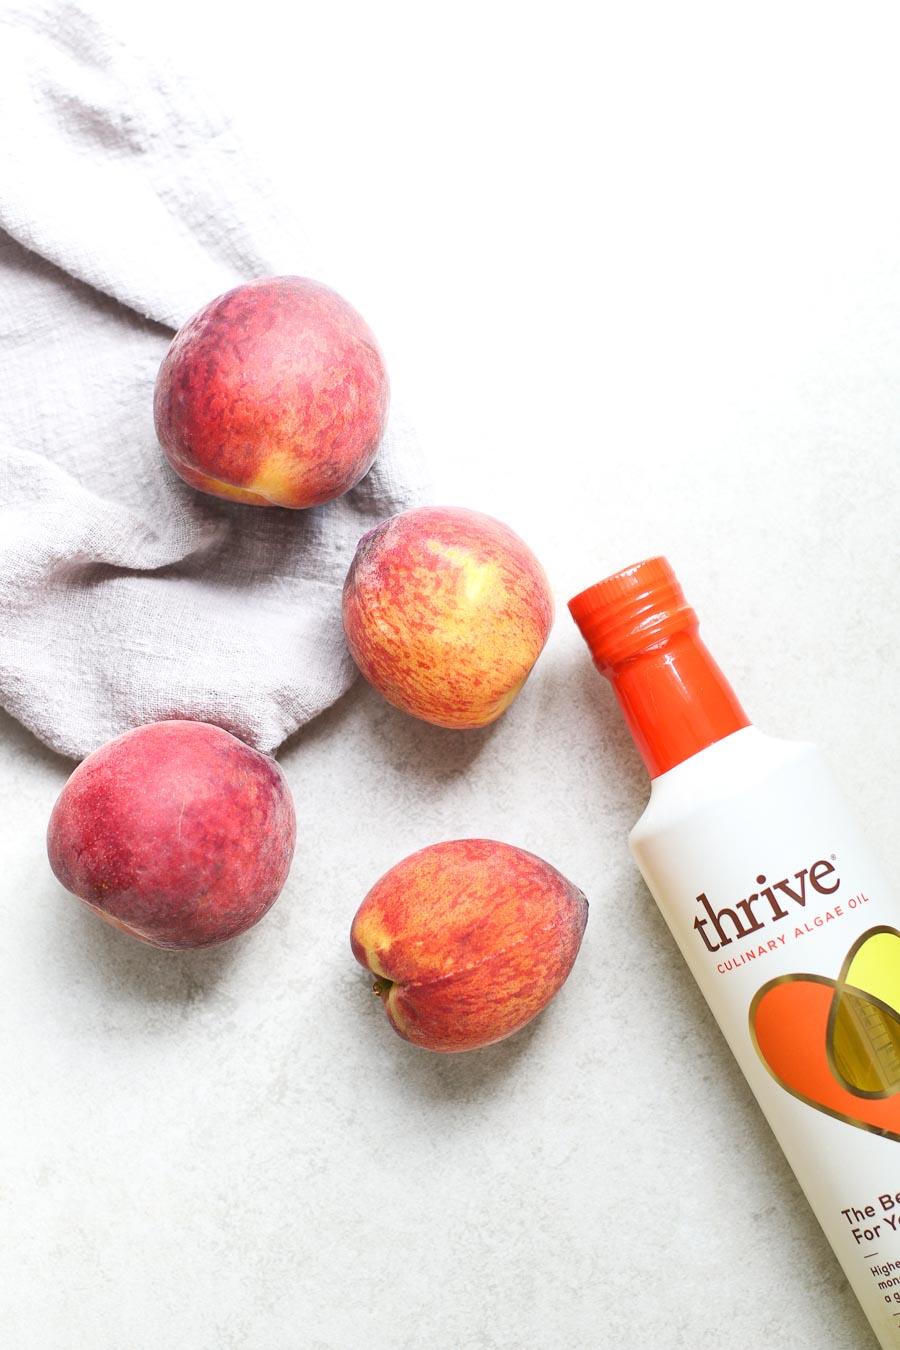 Peaches with Bottle Thrive Algae Oil